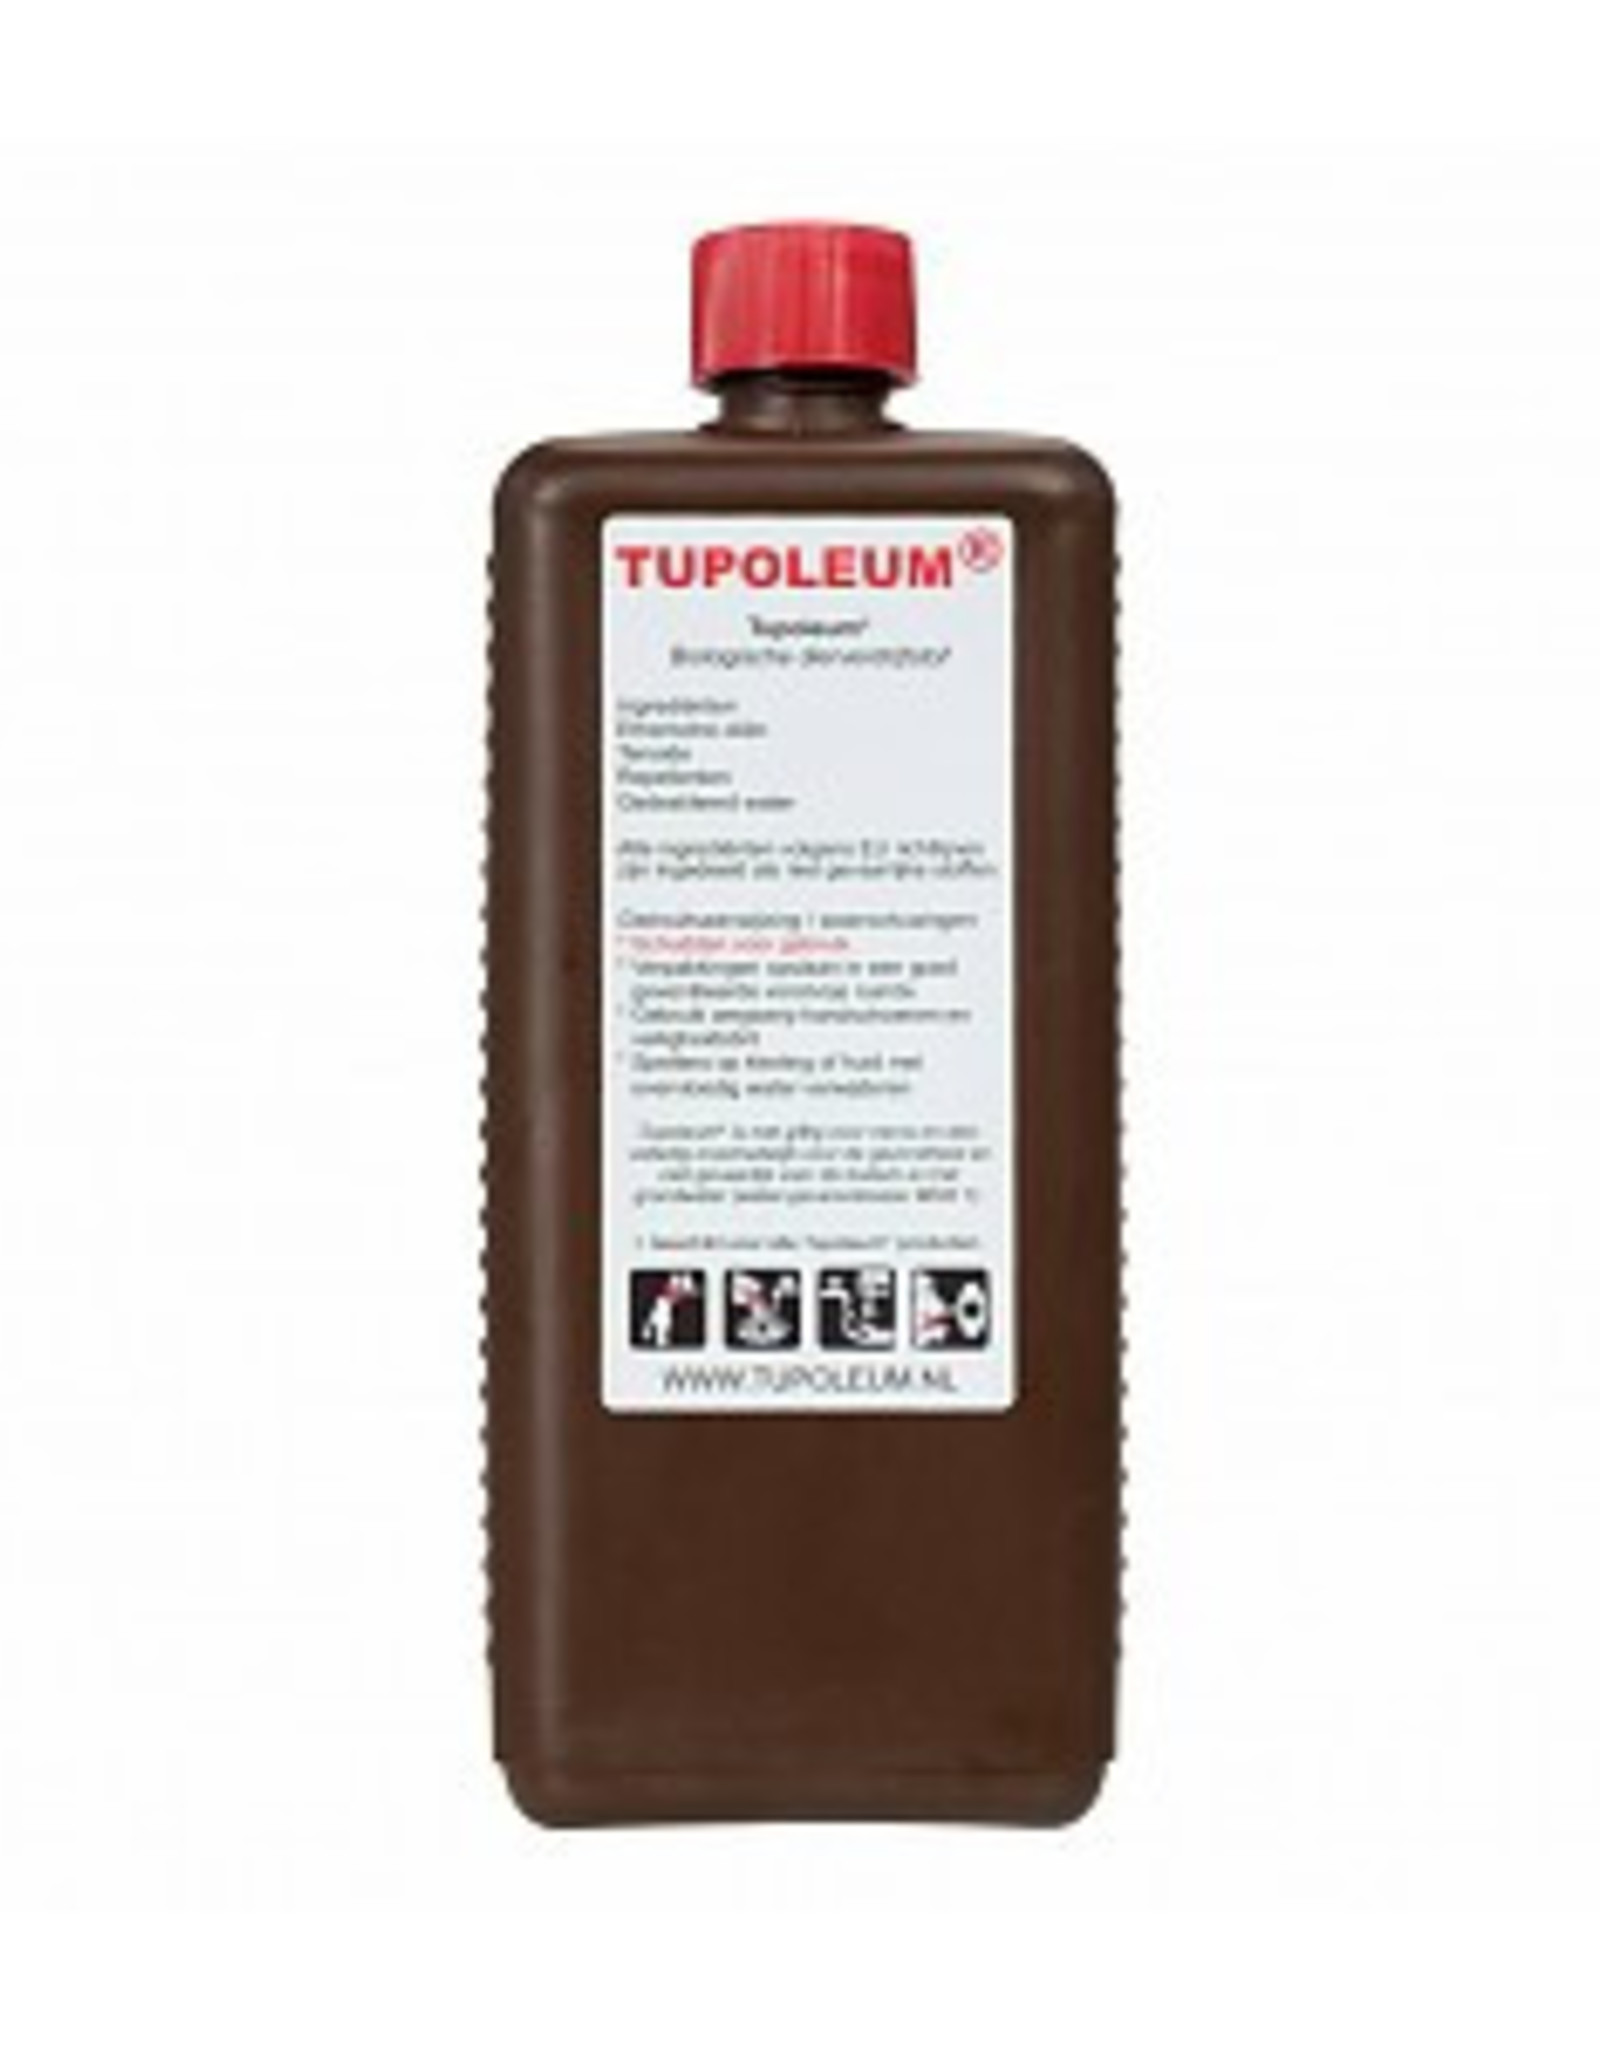 Brimex Tupoleum Vulling voor alle Tupoleum producten